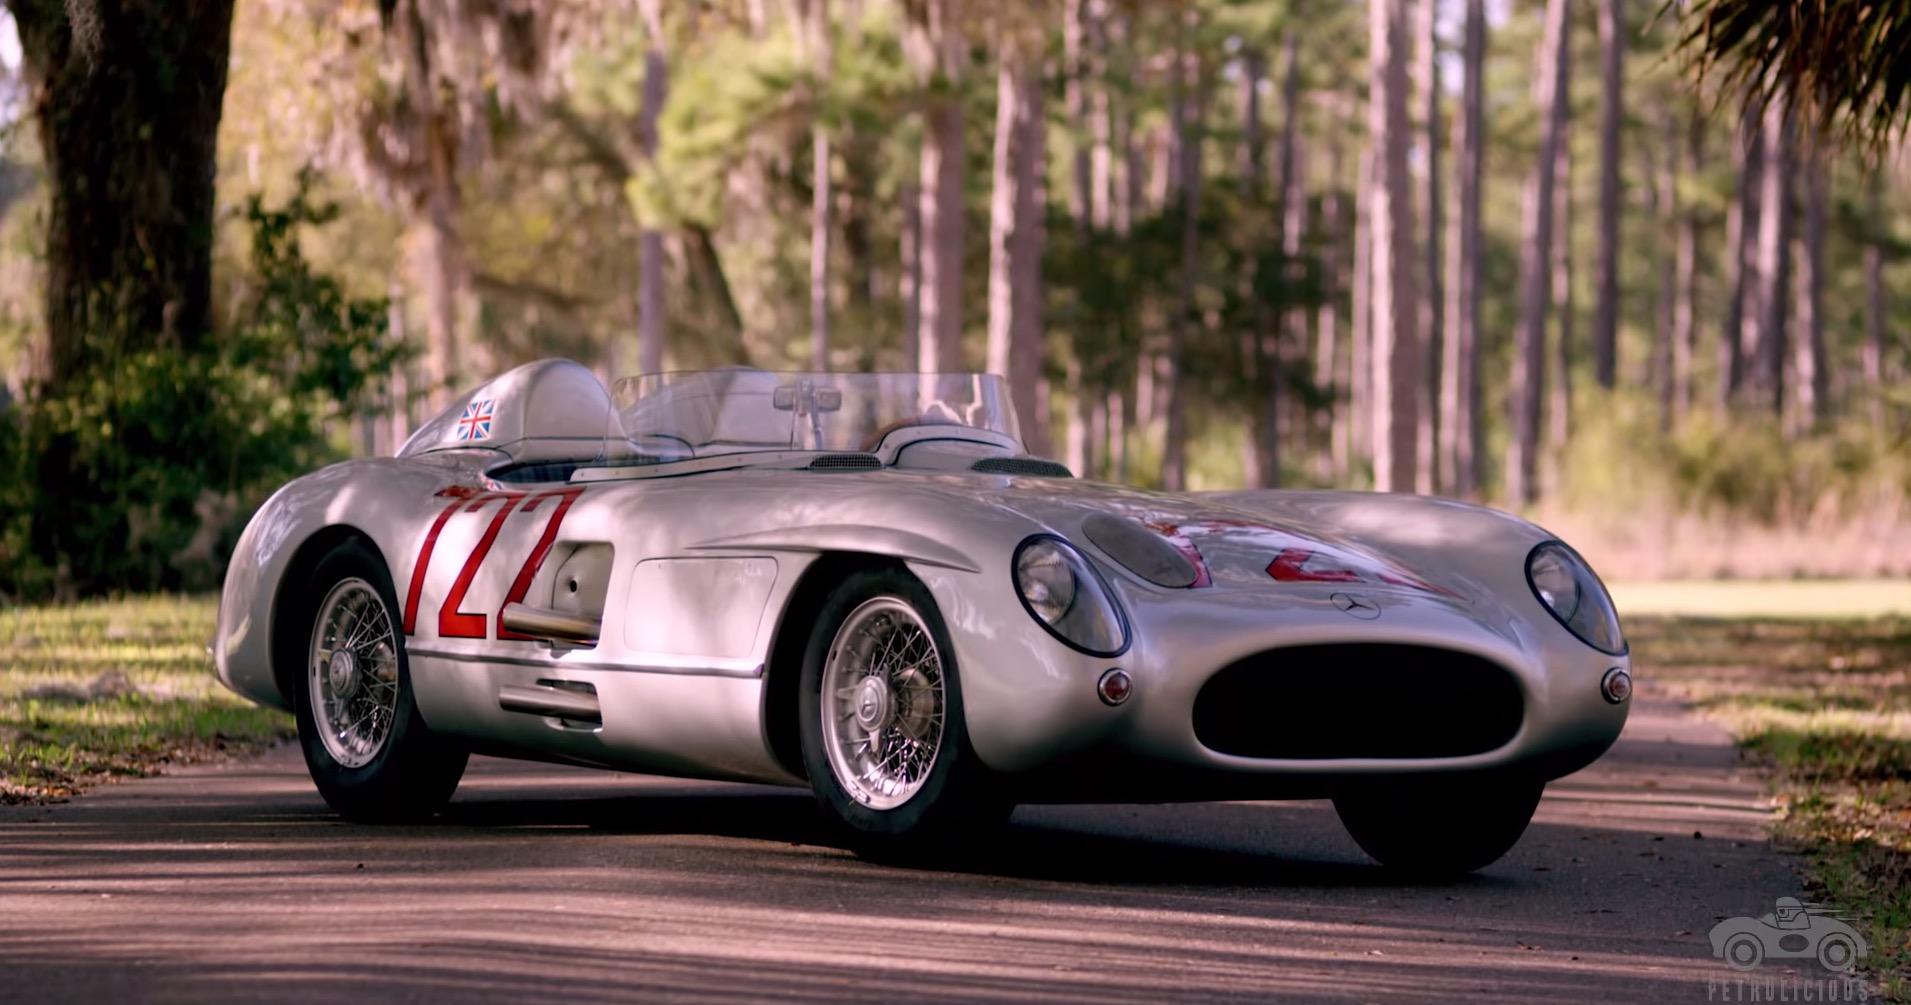 Sir stirling moss und der mercedes benz 300 slr 546556 for Mercedes benz 300 slr